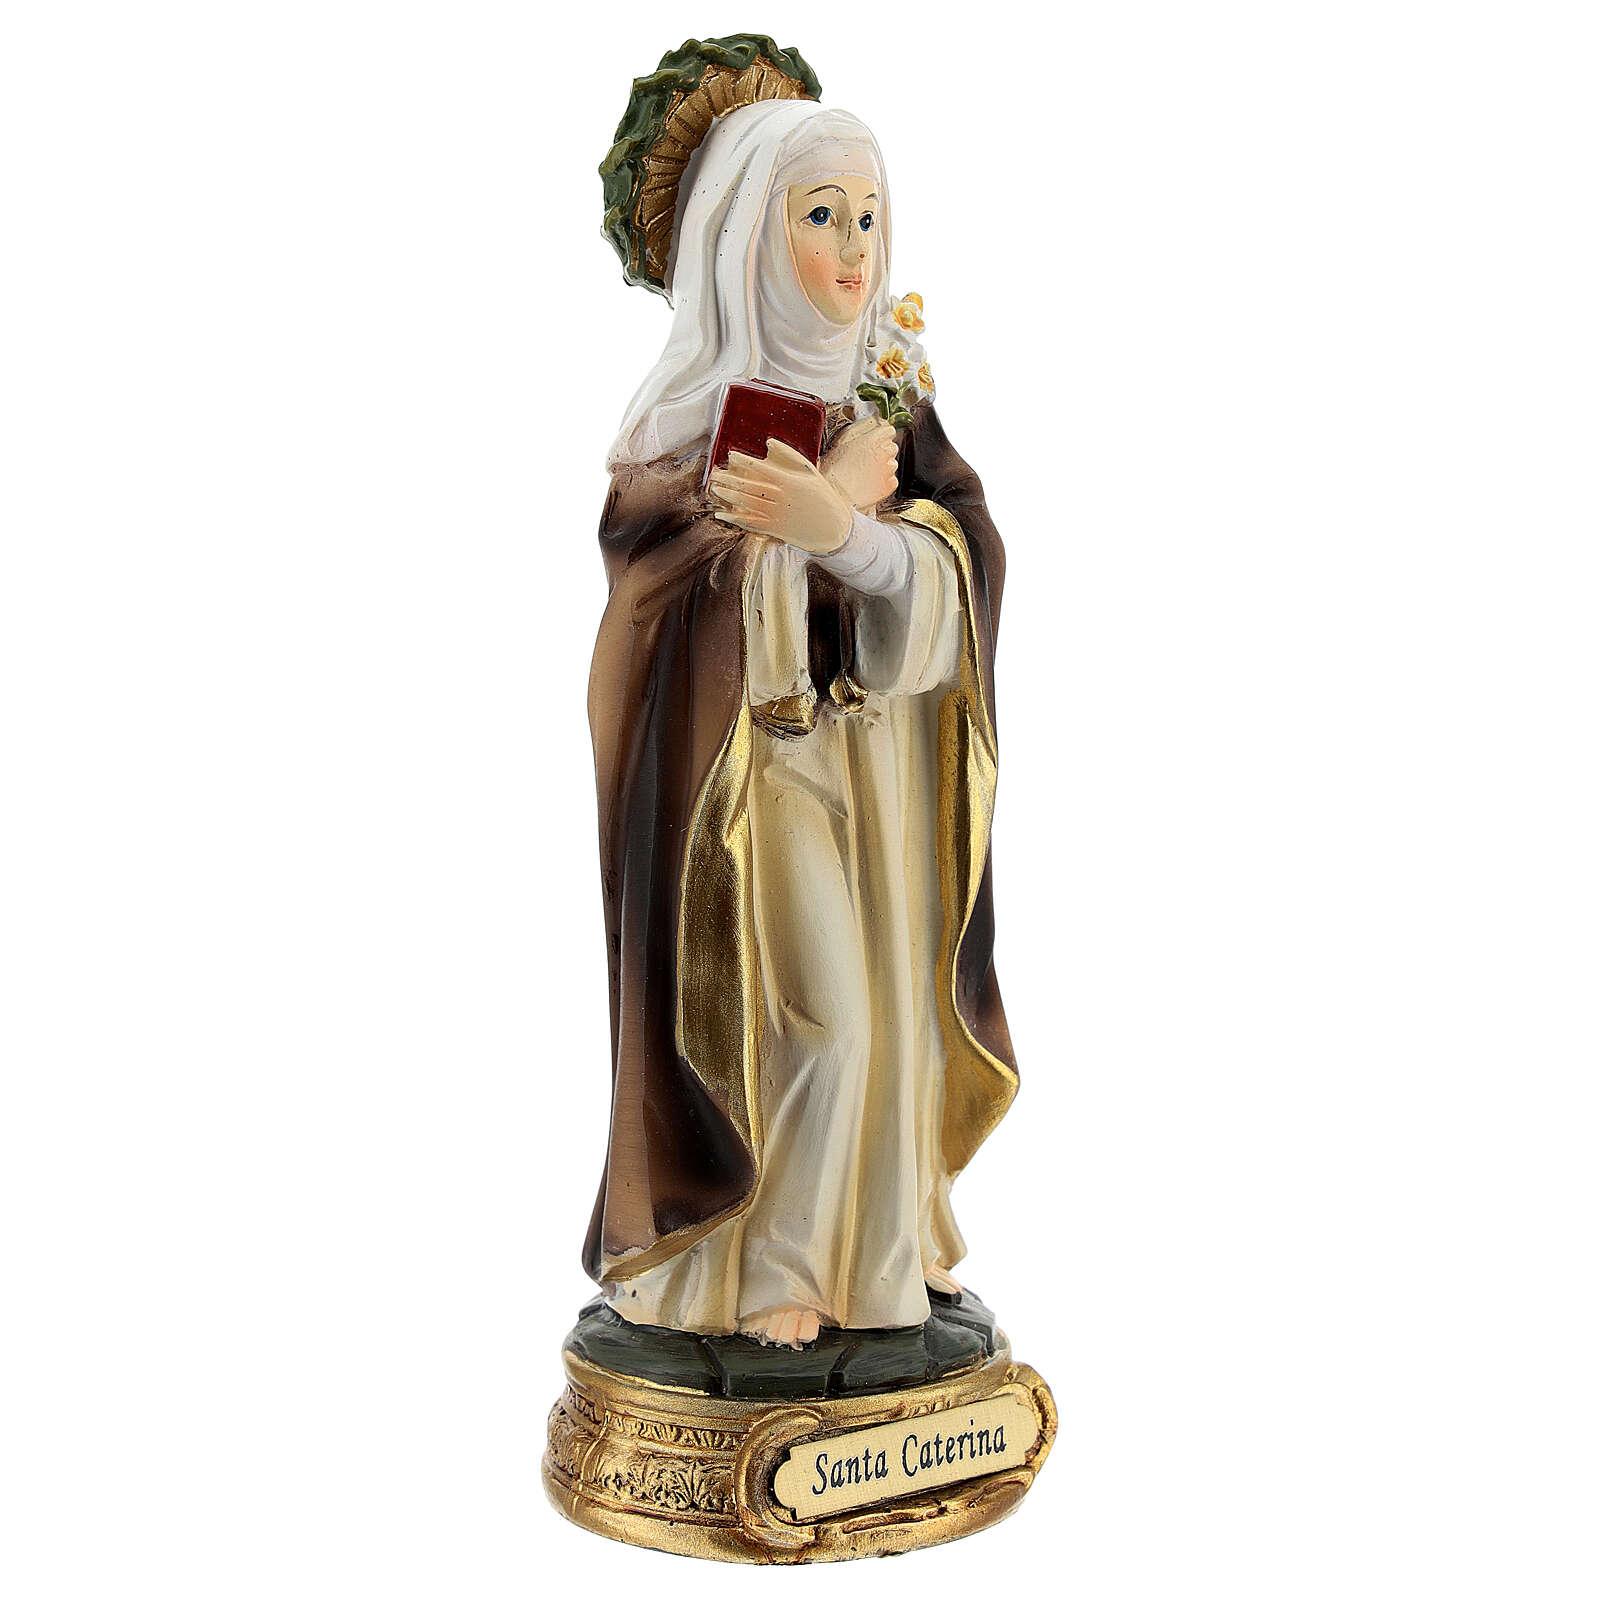 Santa Caterina Siena corona espinas lirio estatua resina 12 cm 4